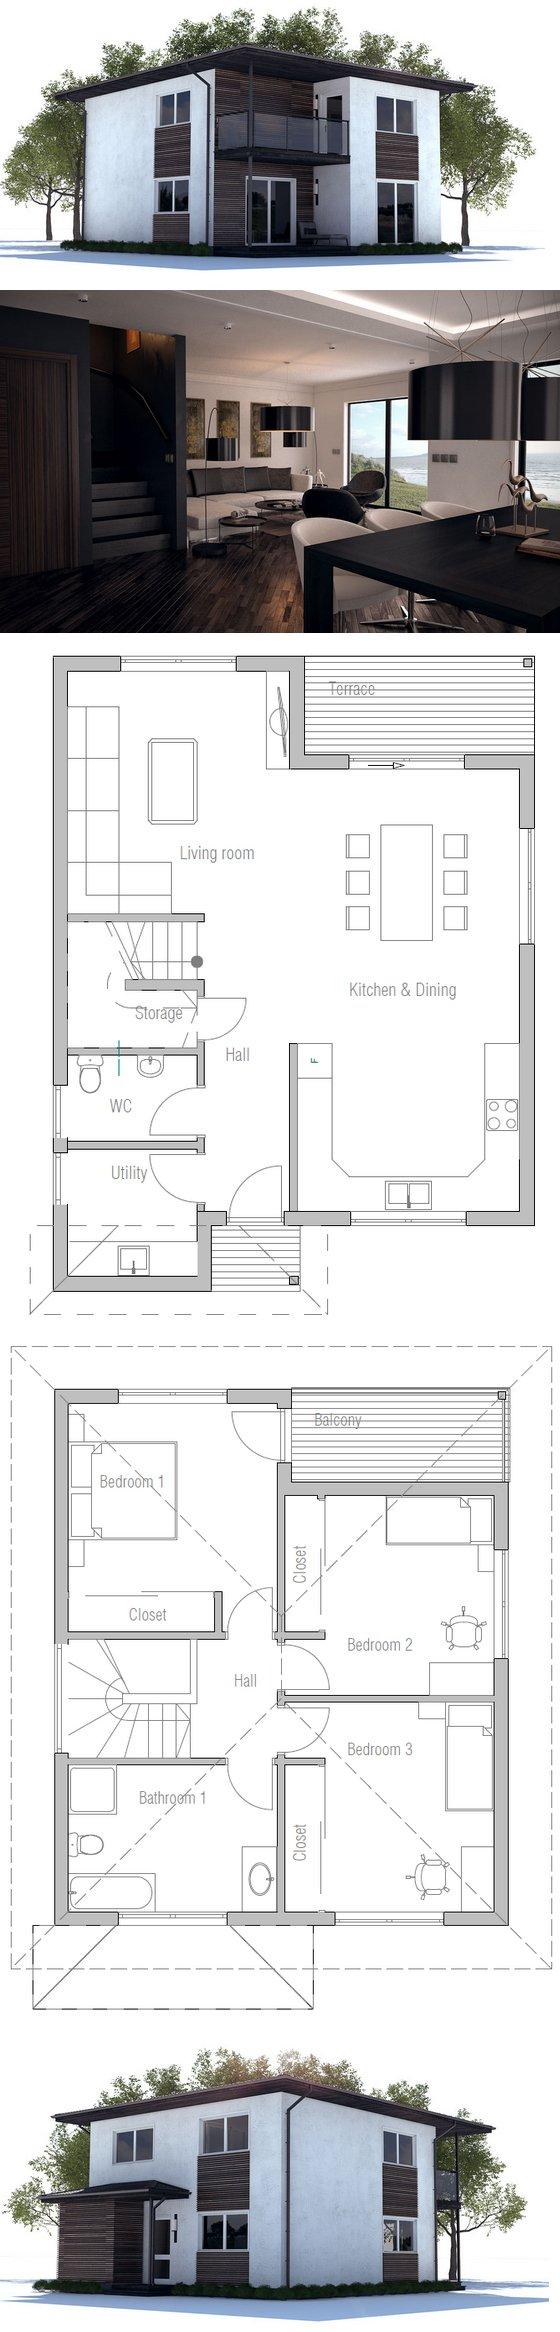 Small House Ch237 House Plans House House Design